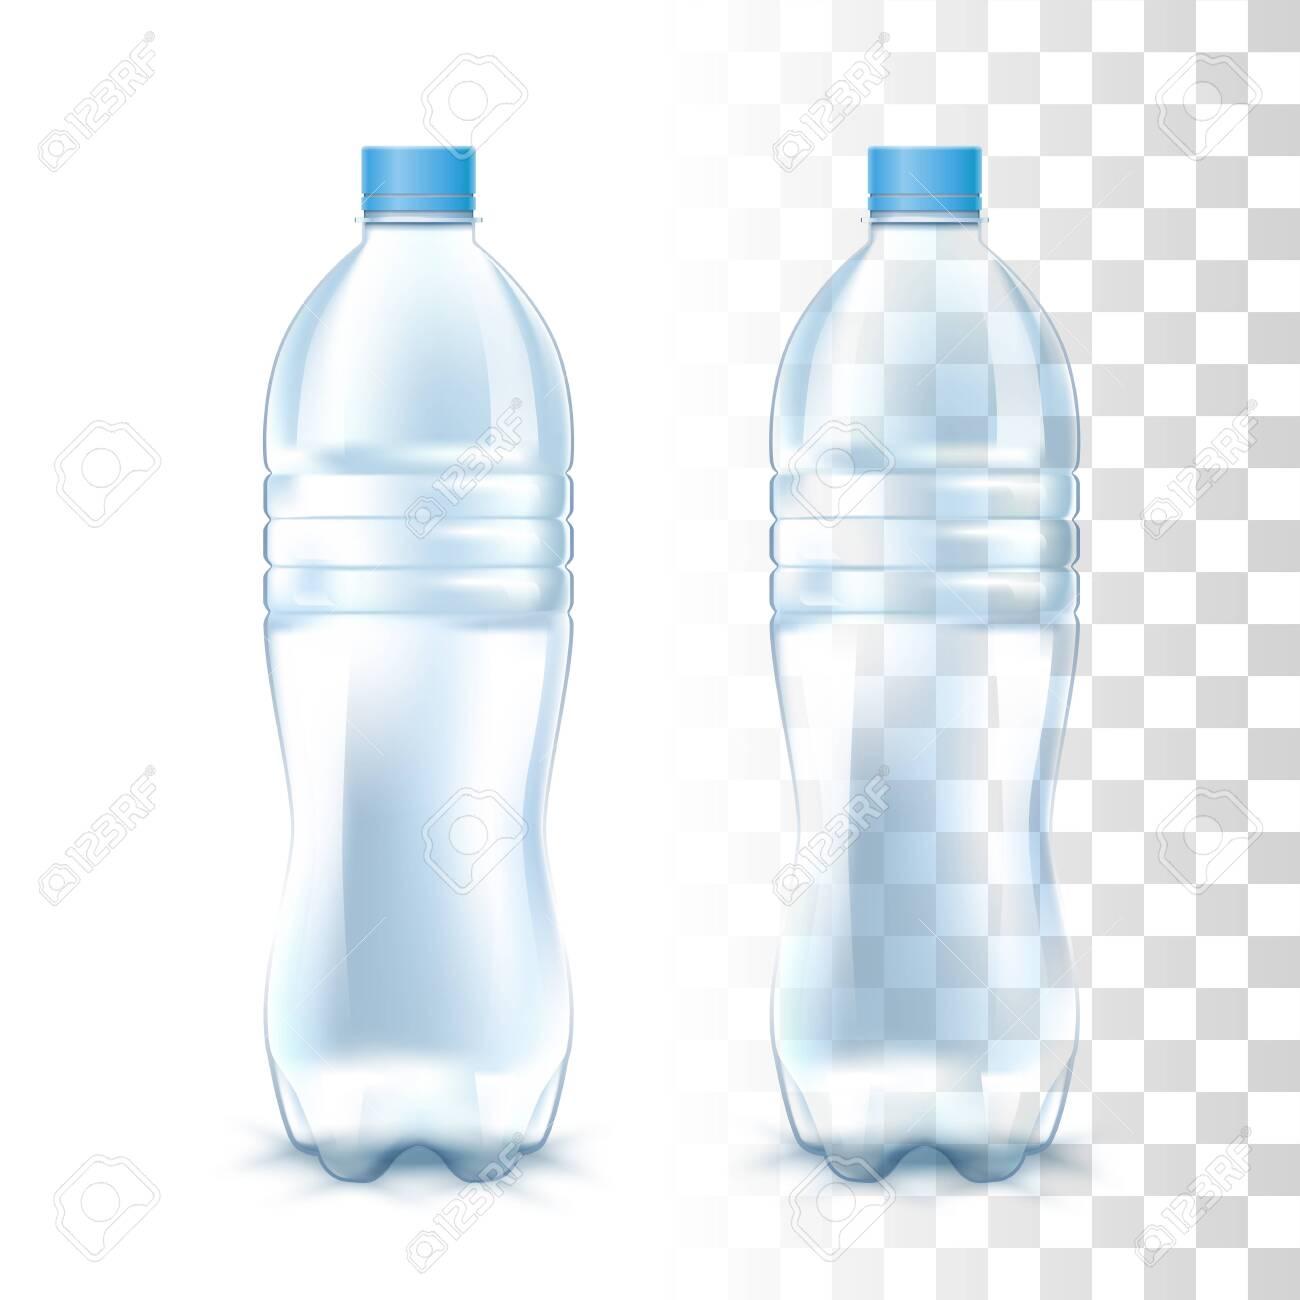 Clear Empty Transparent Plastic Bottle. 3d Vector Photo Realistic Mockup - 124295402